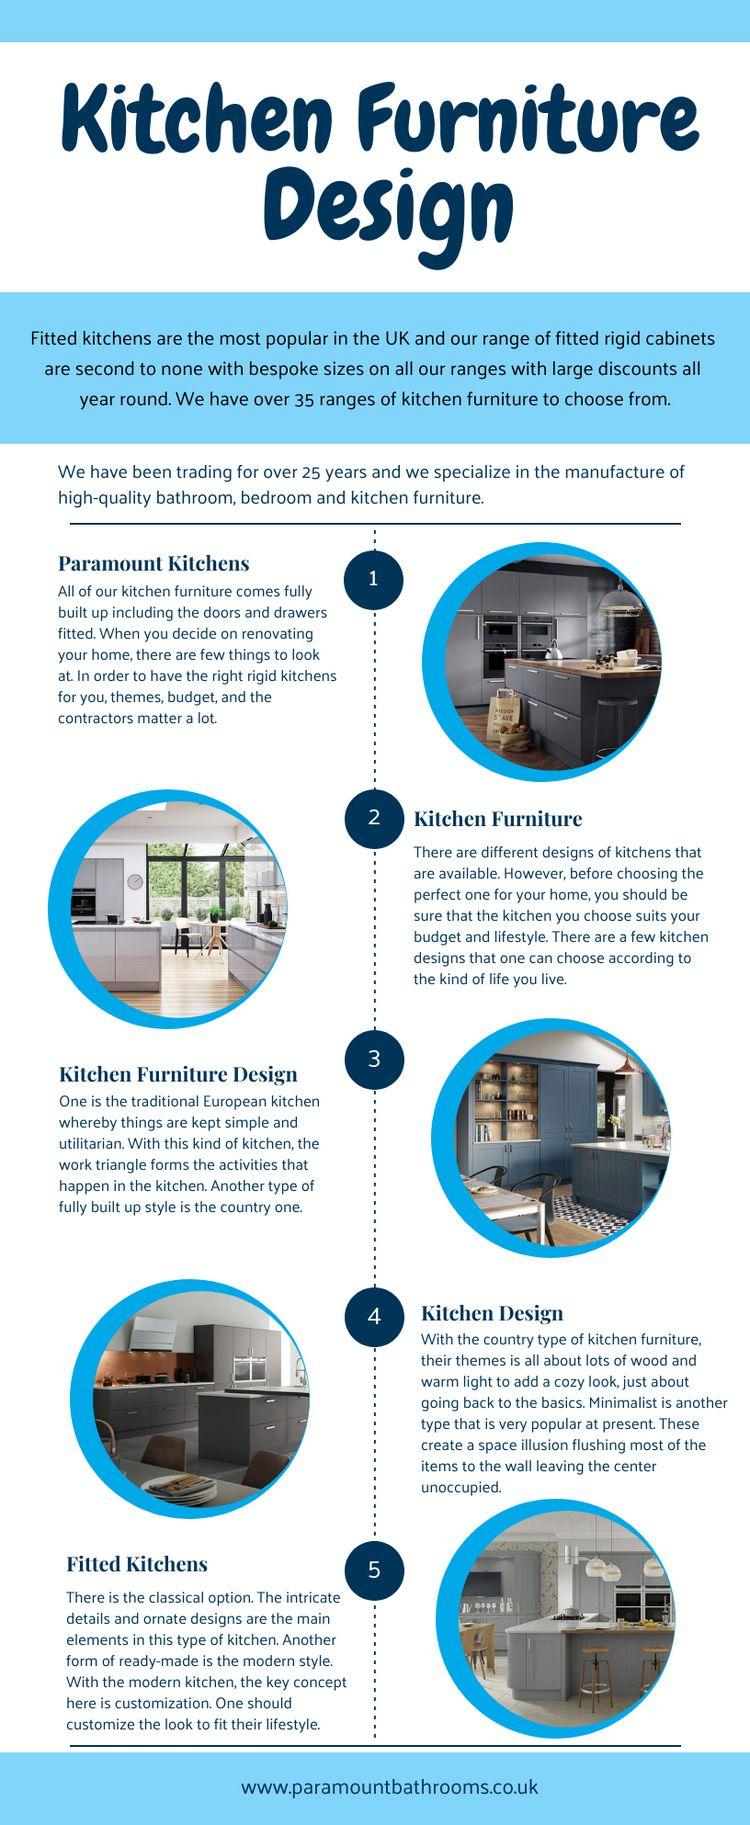 Kitchen Furniture Design UK man - paramountbathrooms | ello